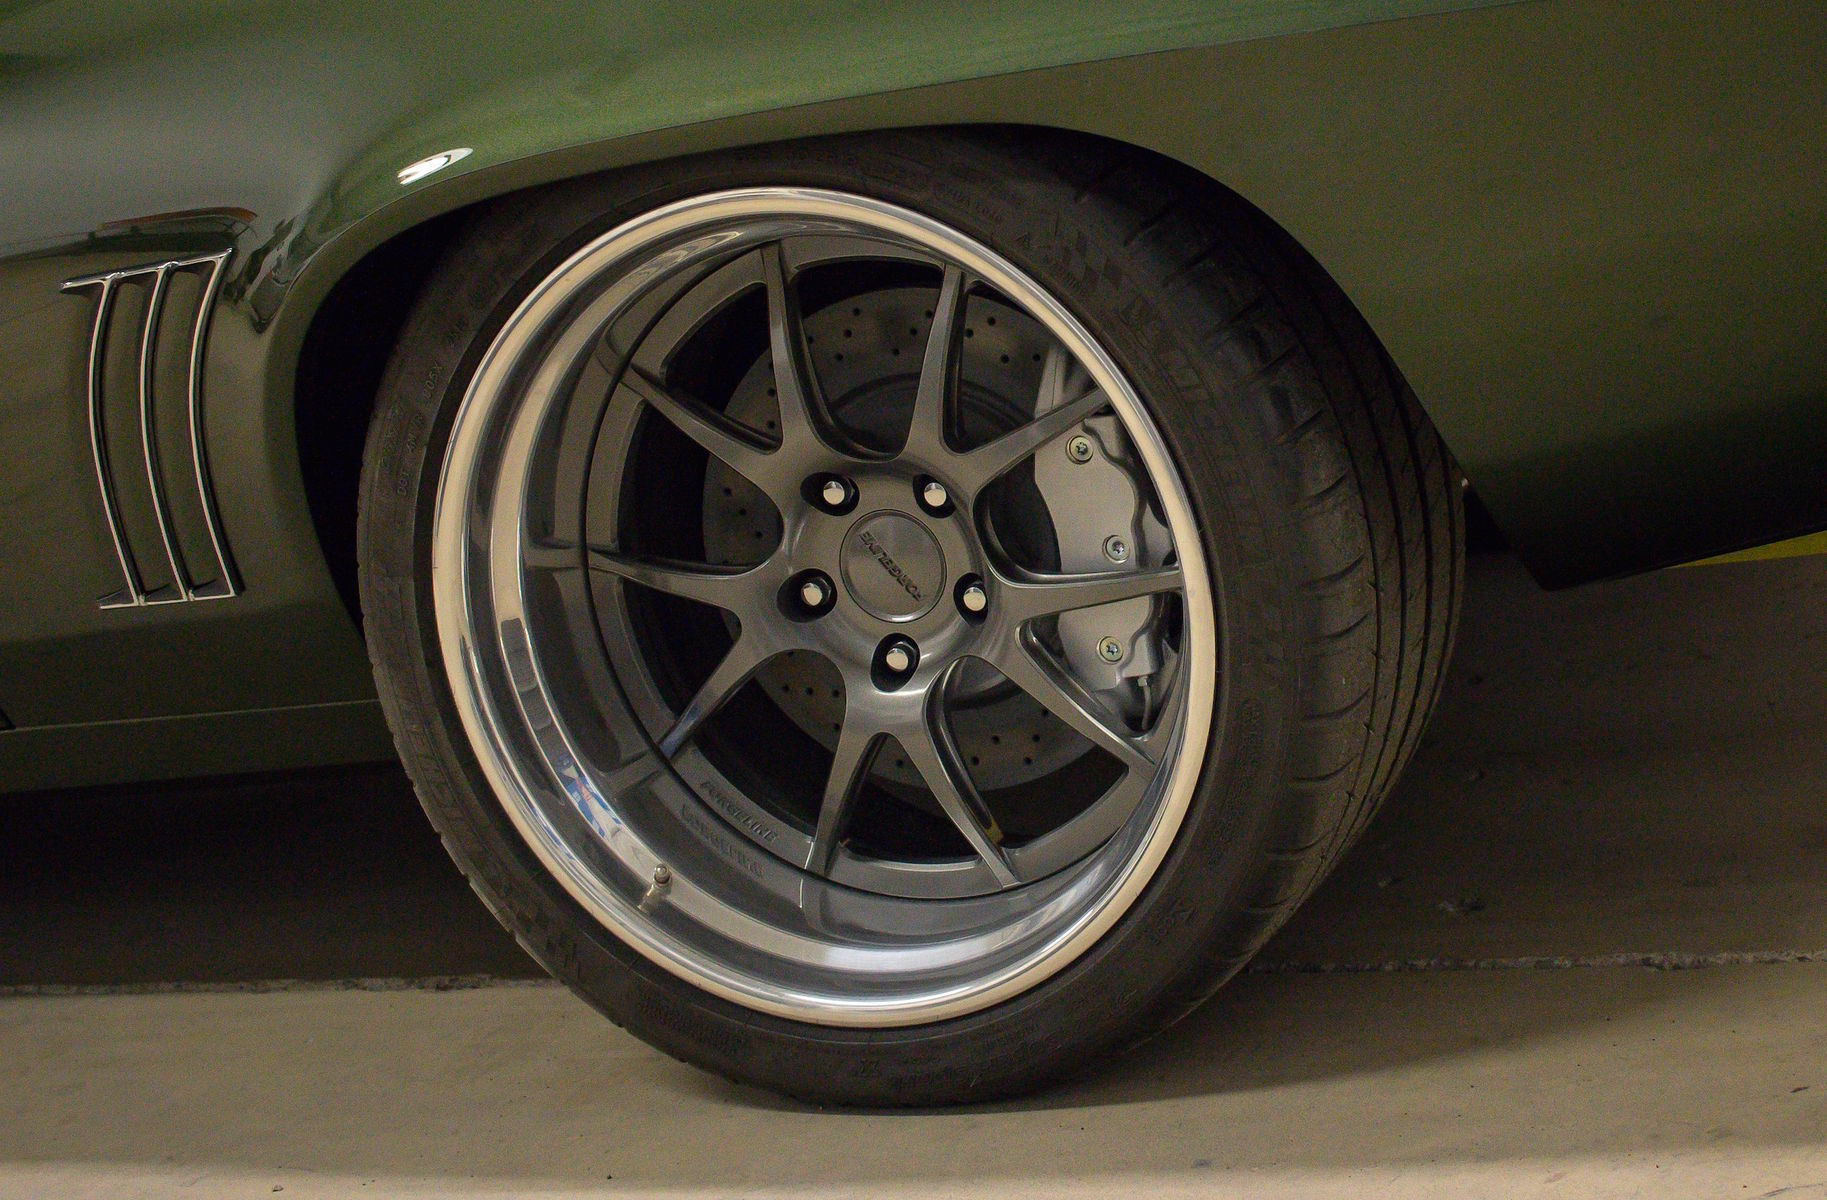 1969 Chevrolet Camaro | Chris Kinker's Fathom Green '69 Camaro on Forgeline GA3 Wheels